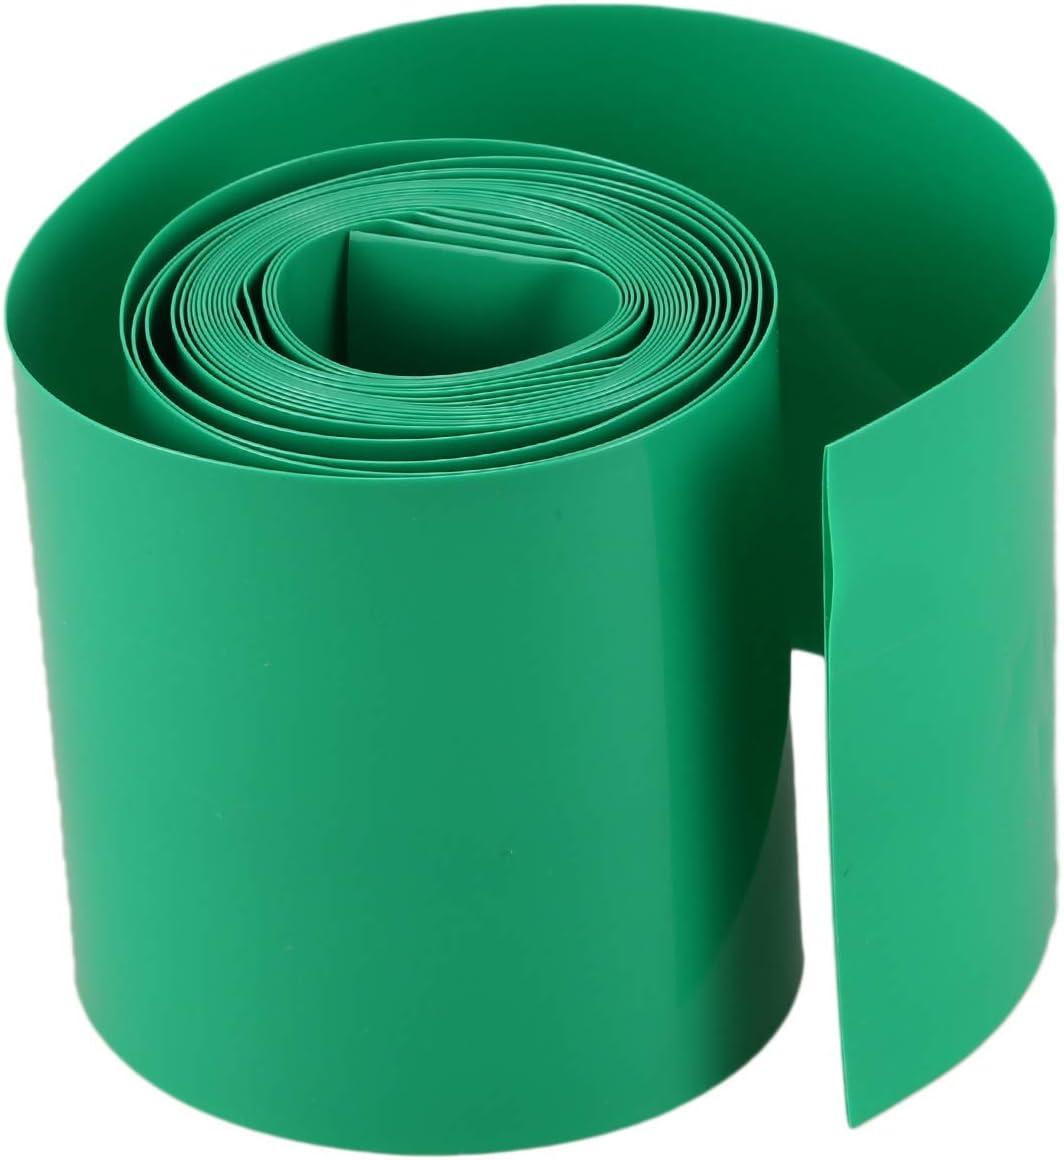 Gaoominy 2M 50mm Vert Fonce PVC Gaine thermoretractable pour 2 x 18650 Batterie